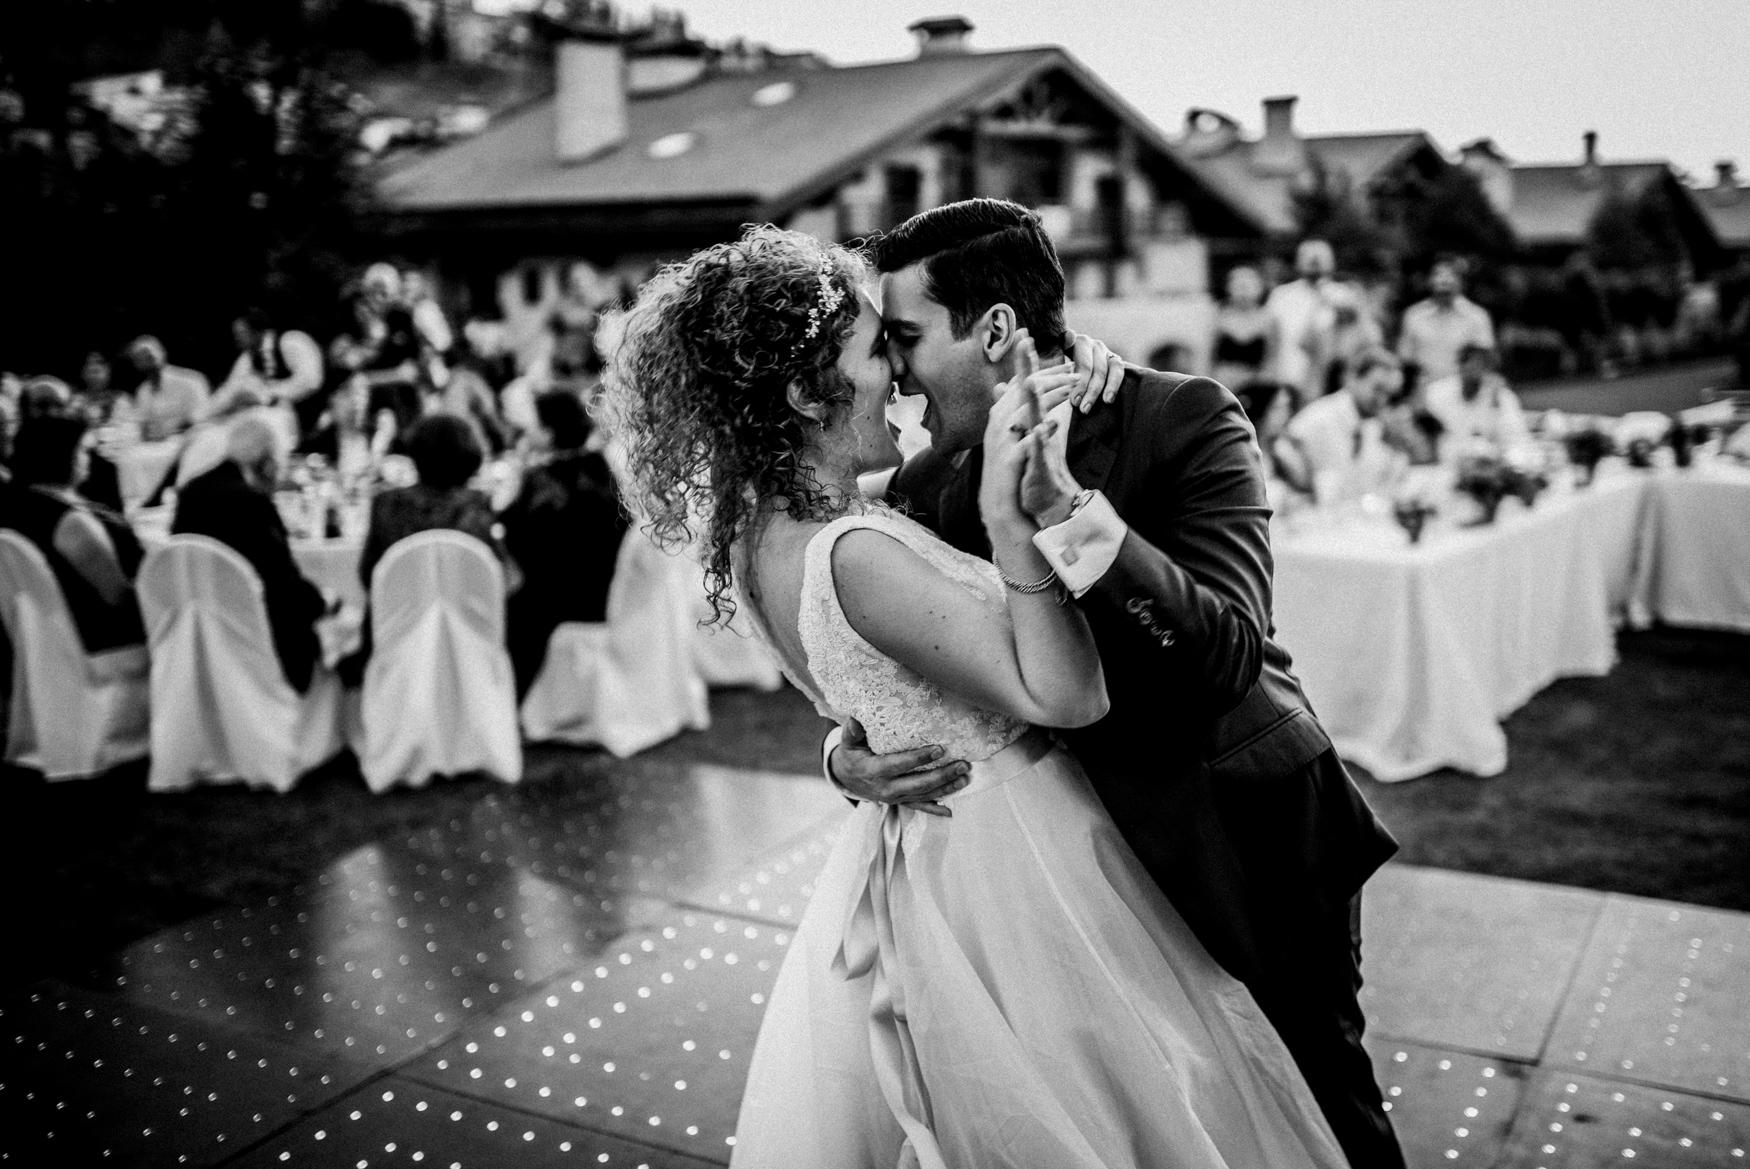 LR5 beirut lebanon mzaar intercontinental wedding photographer 020.jpg